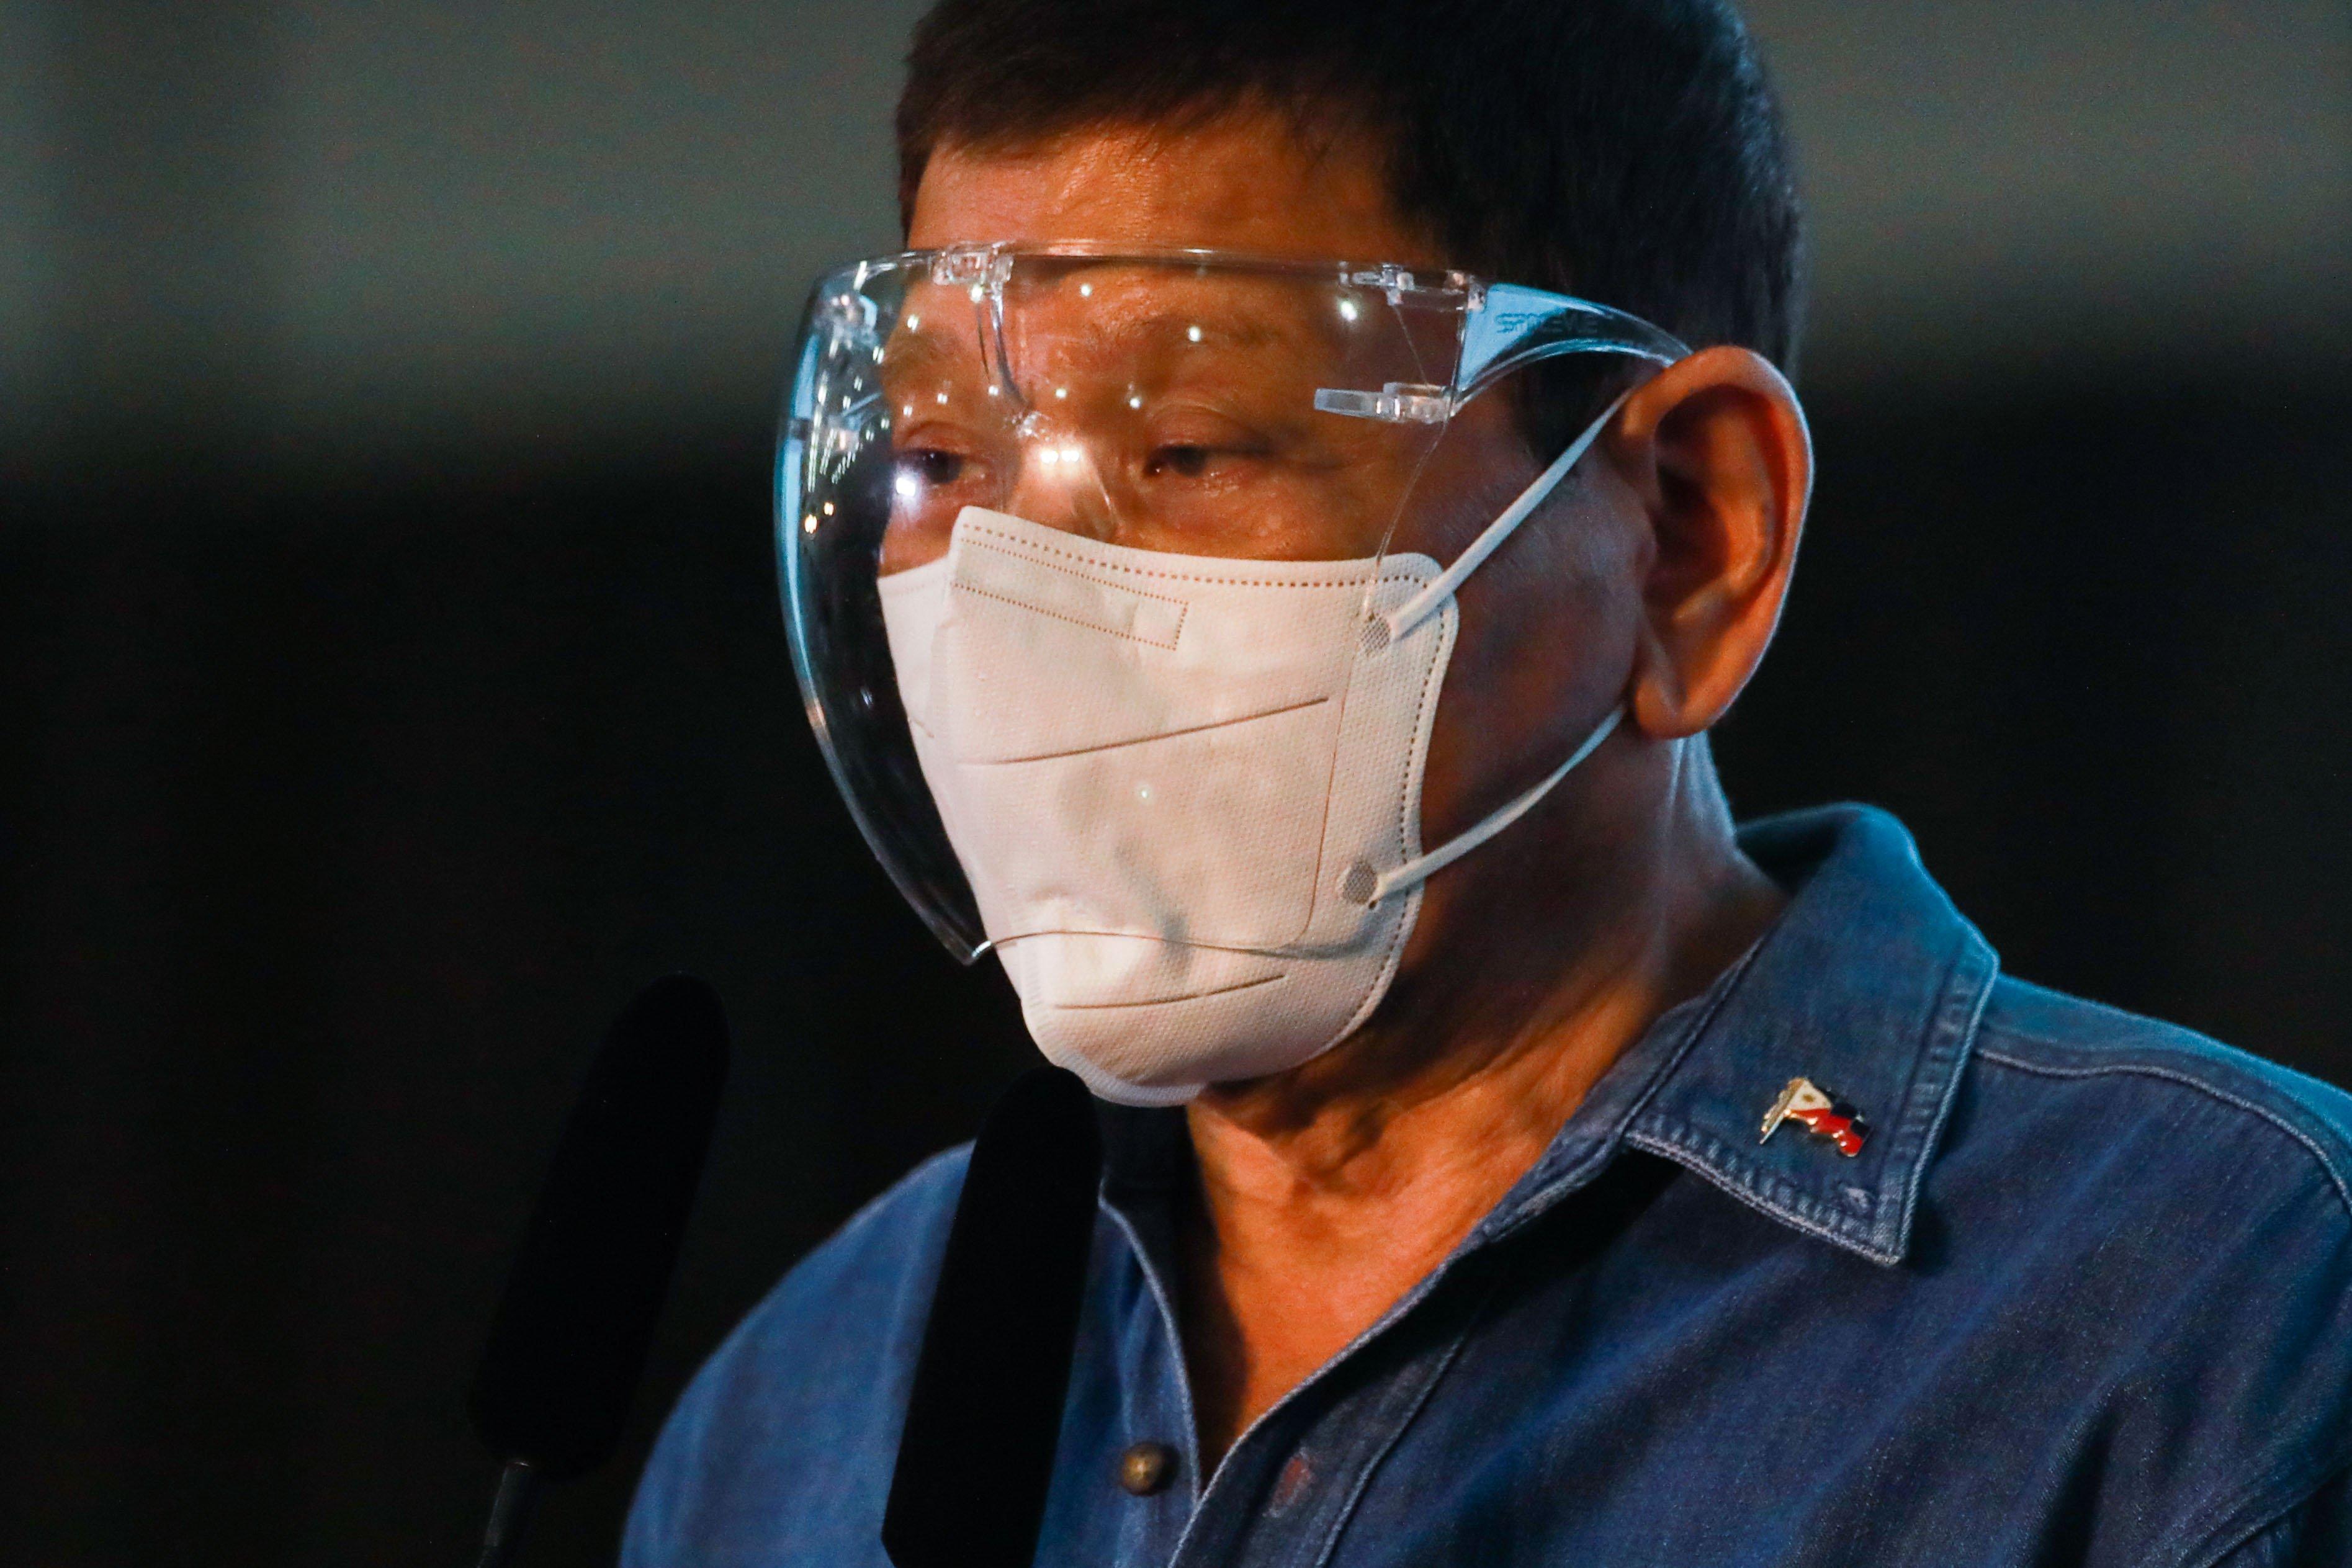 Philippine President Rodrigo Duterte announces 'retirement from politics'